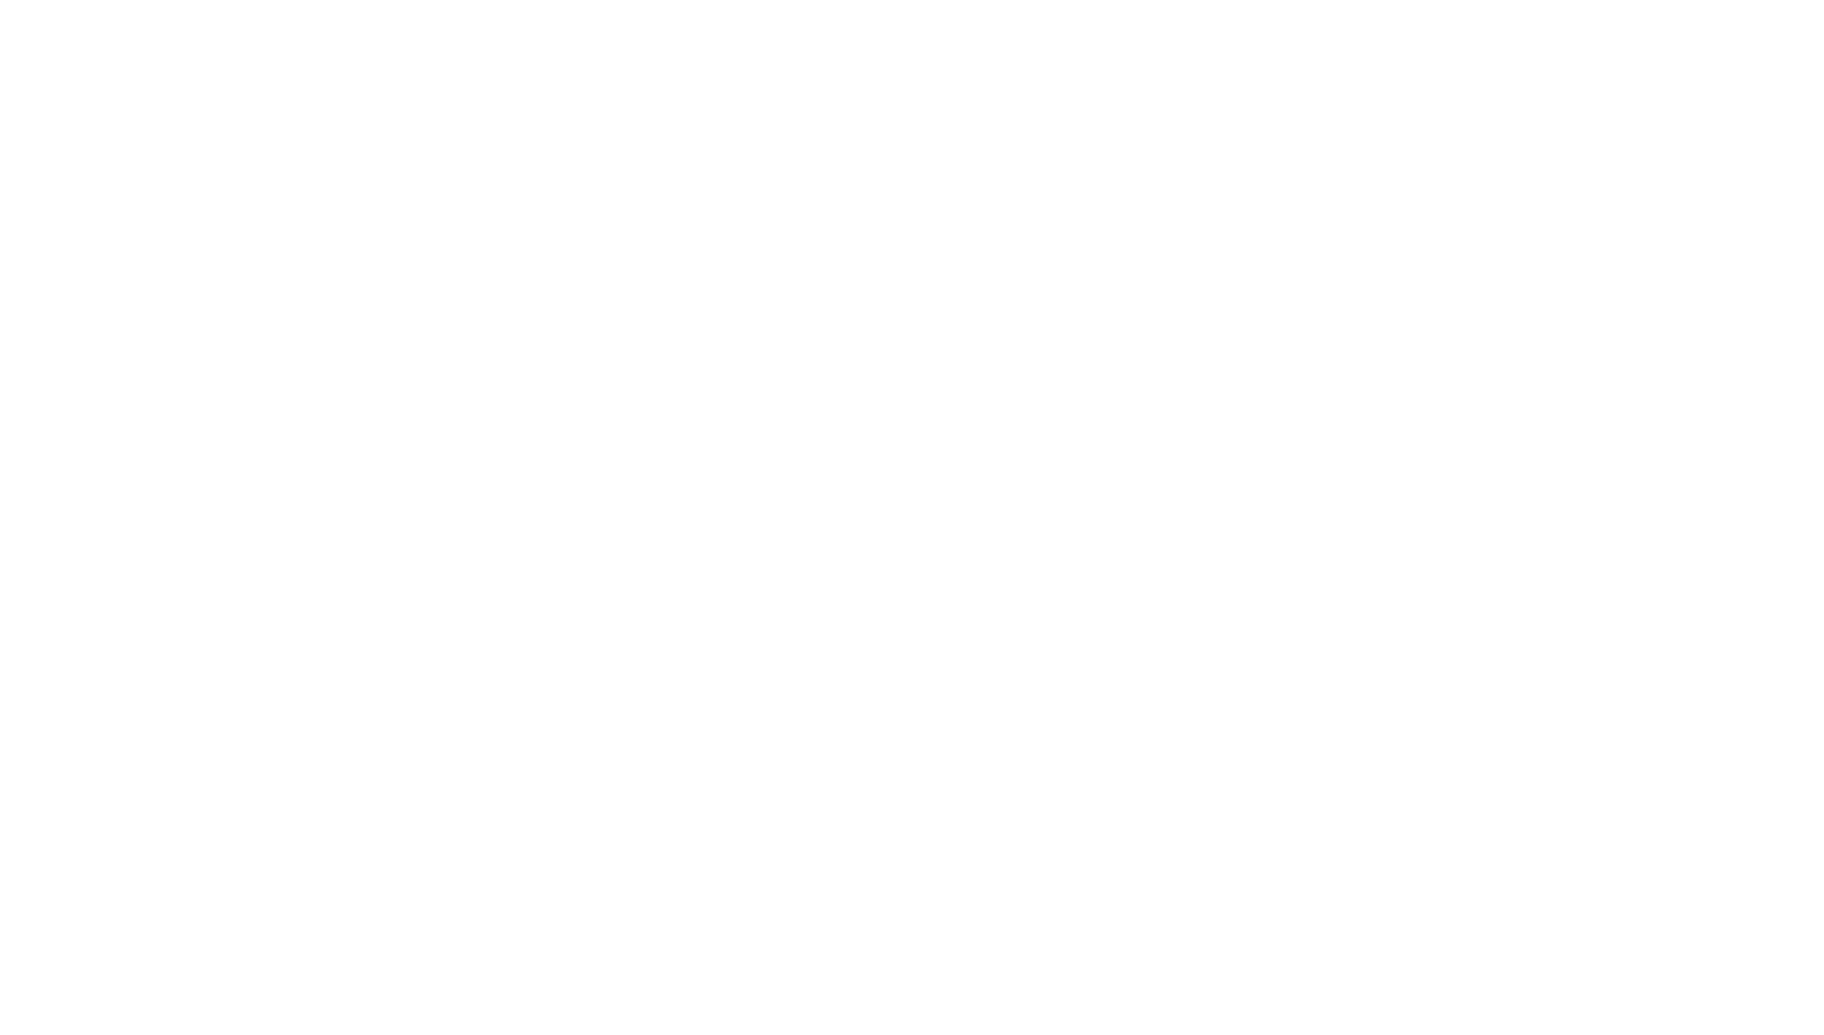 hf-international.png